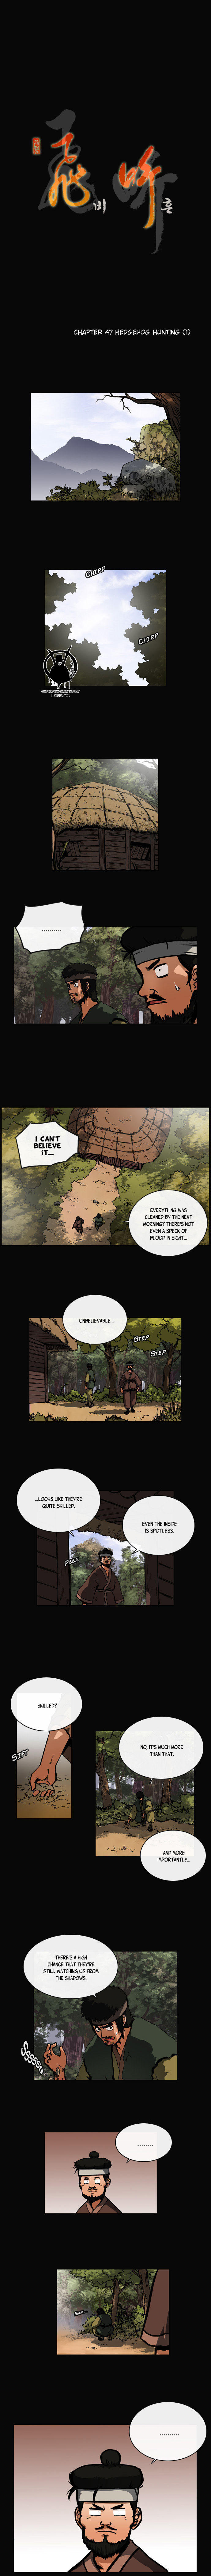 Be Heun 47 Page 2